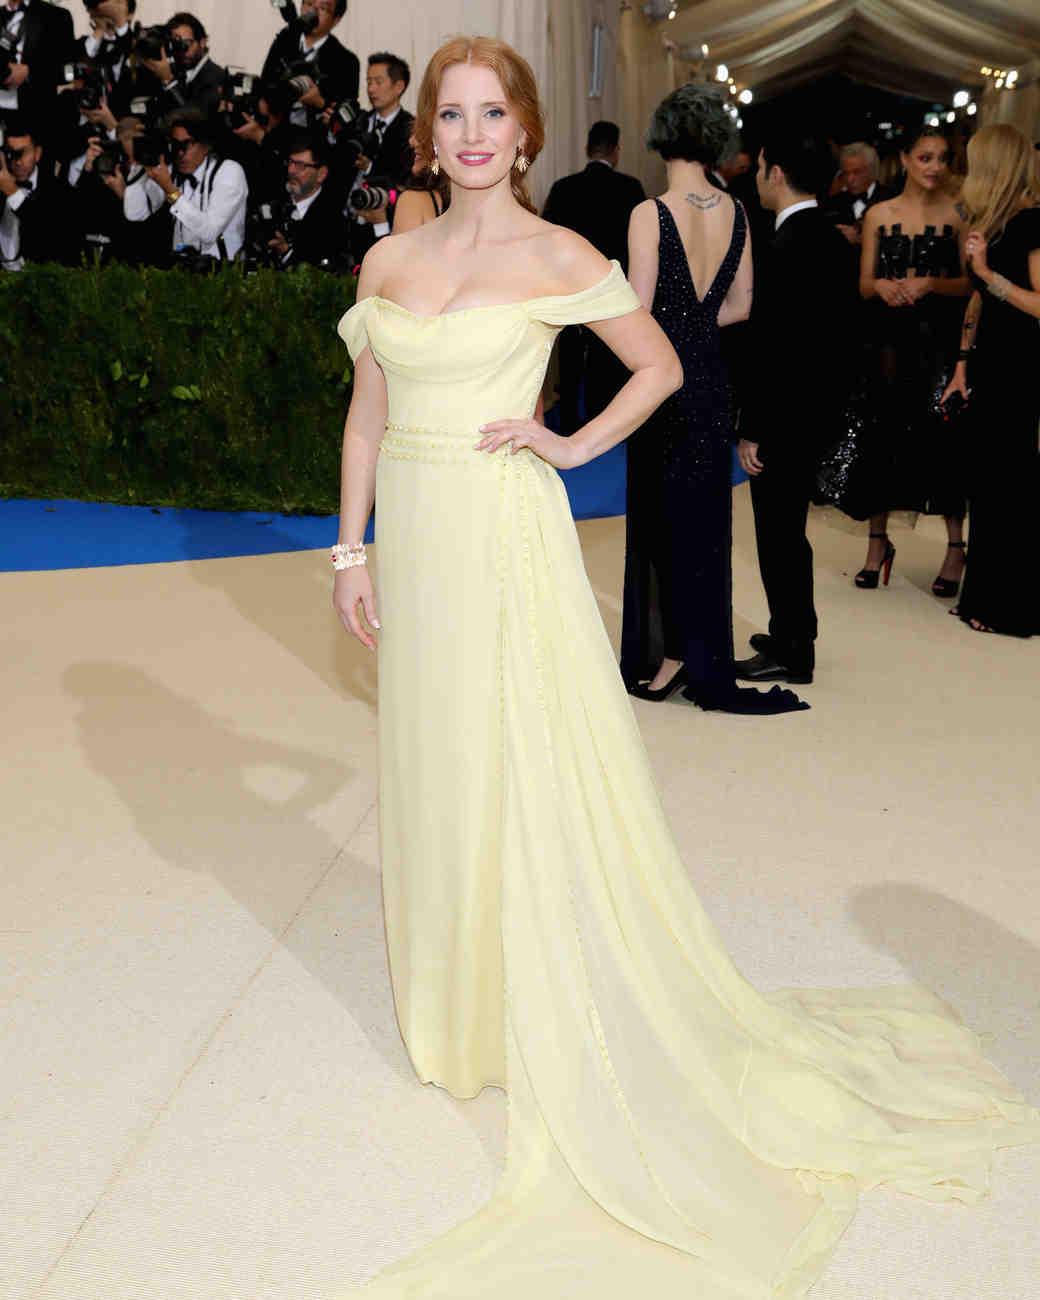 Jessica Chastain Met Gala 2017 Dress